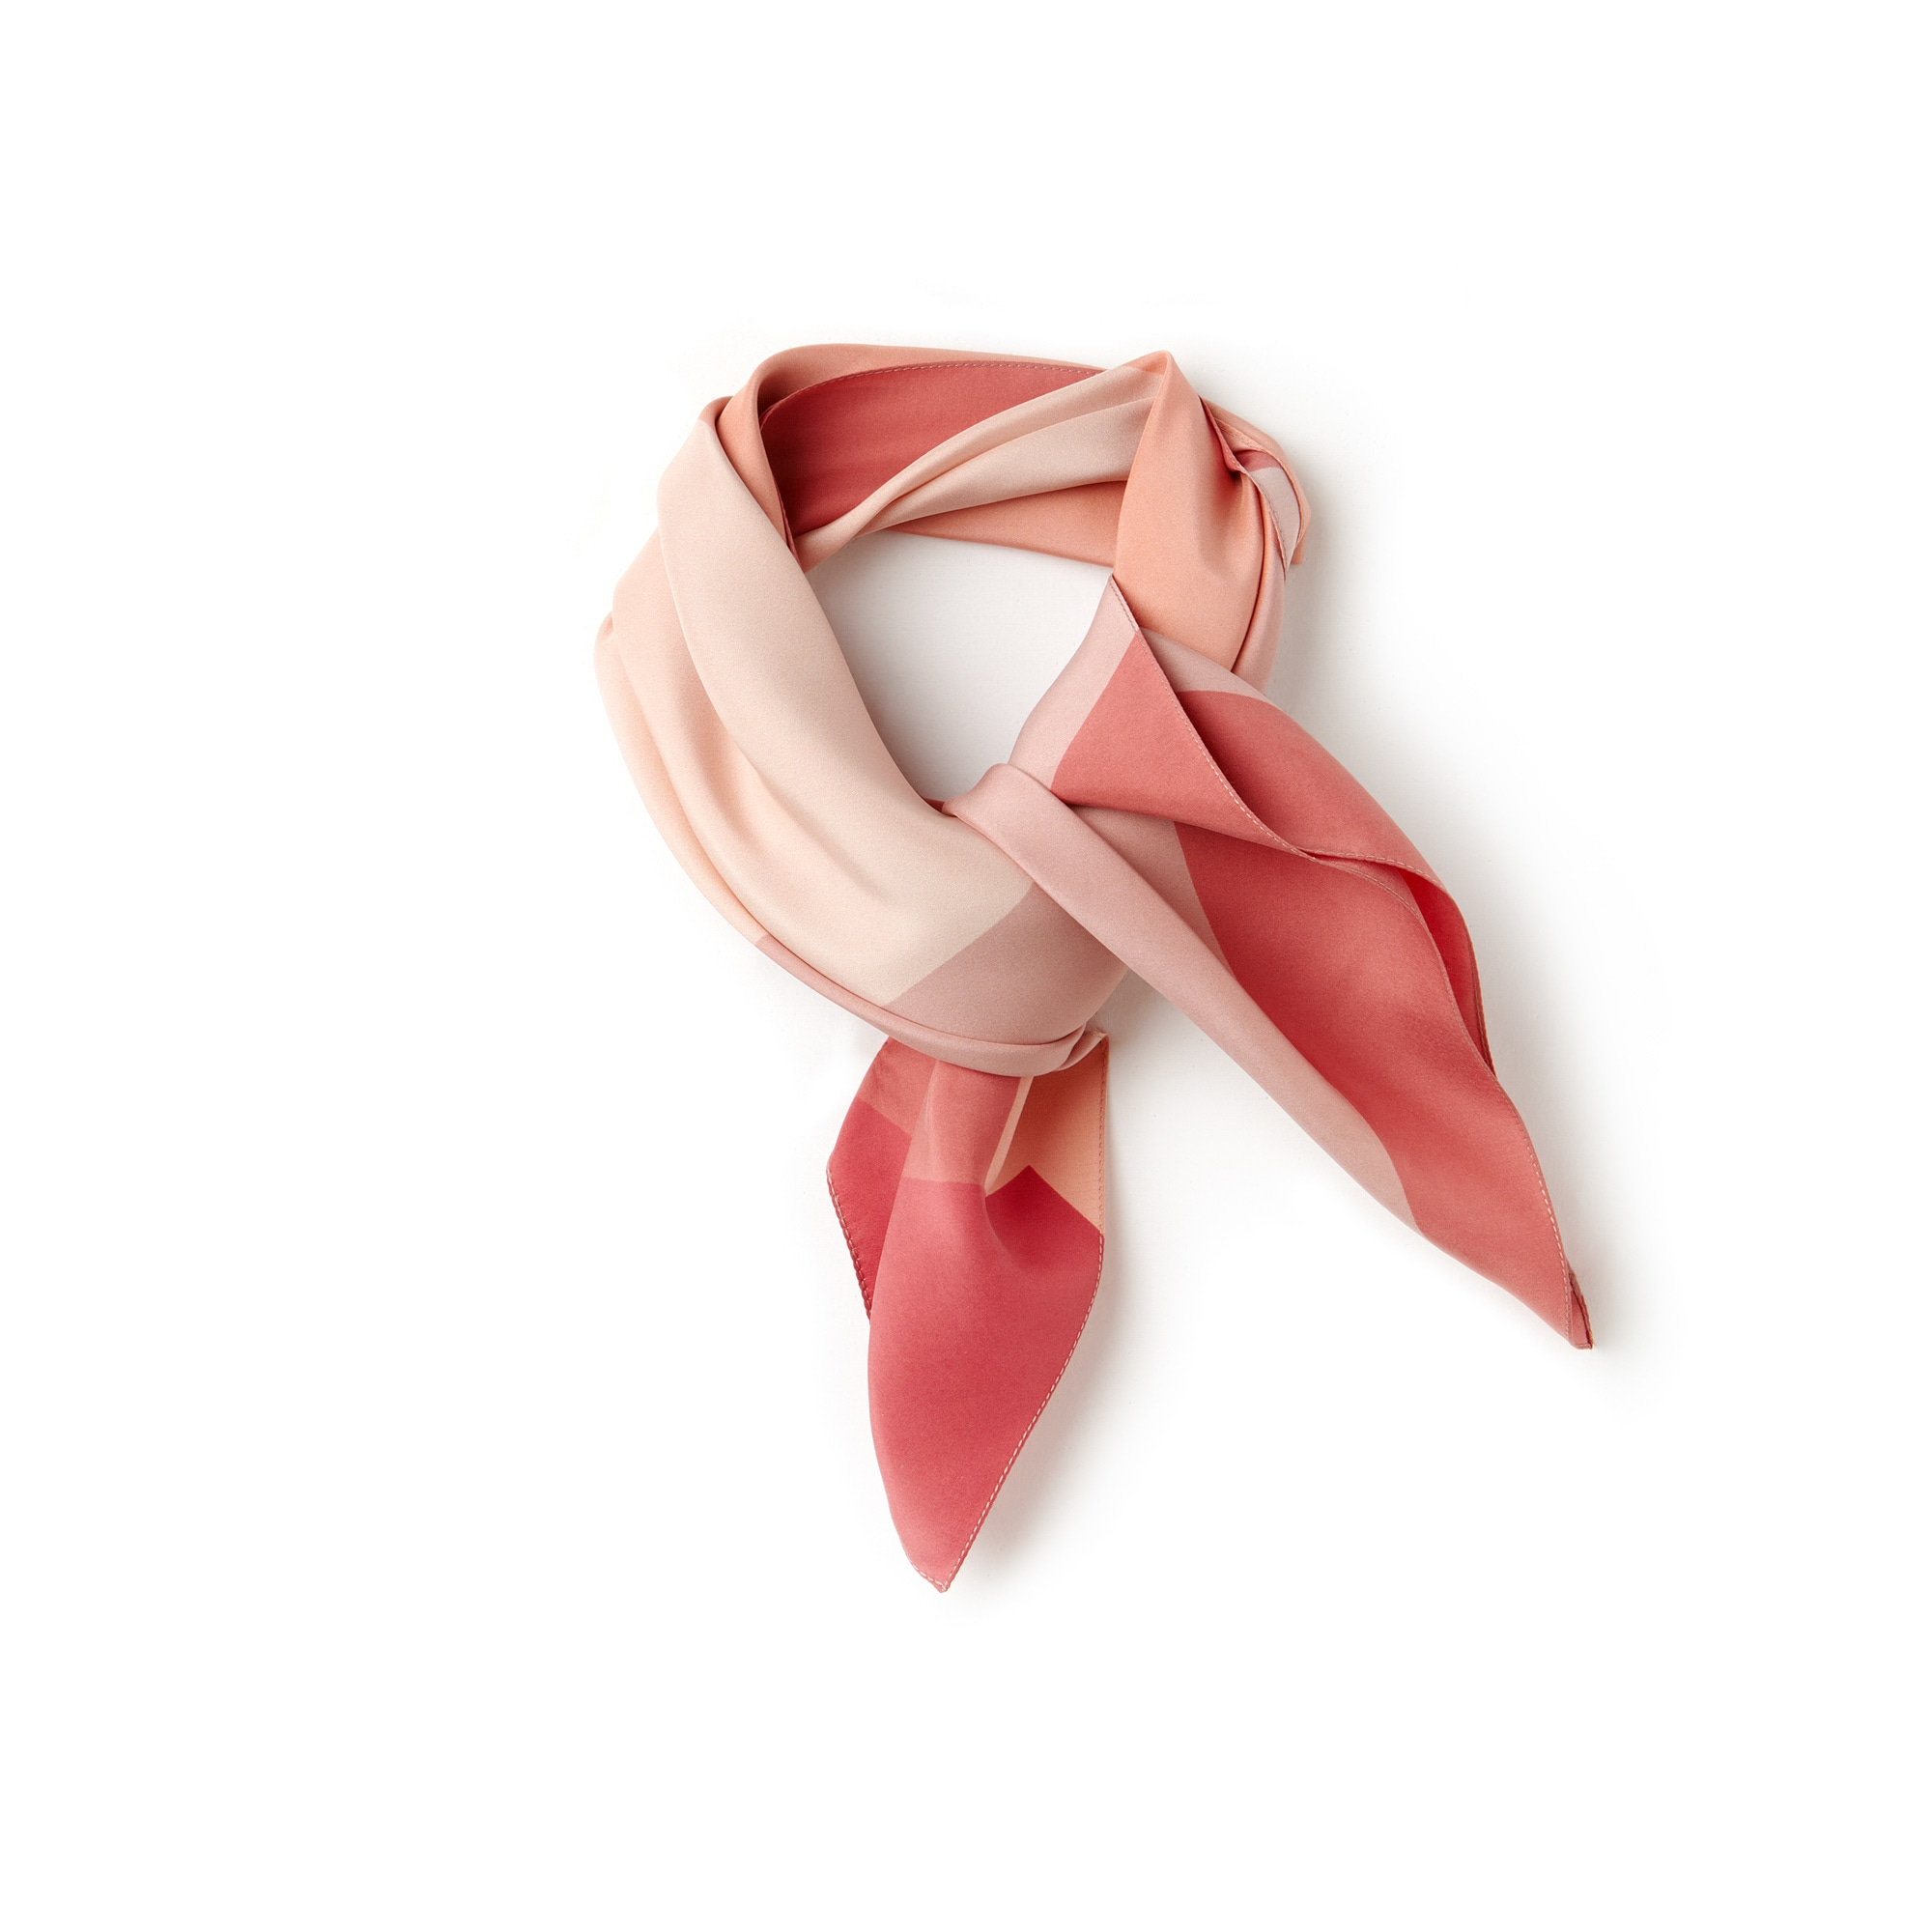 Damen-Bandana aus Seiden-Voile im Colorblock-Design